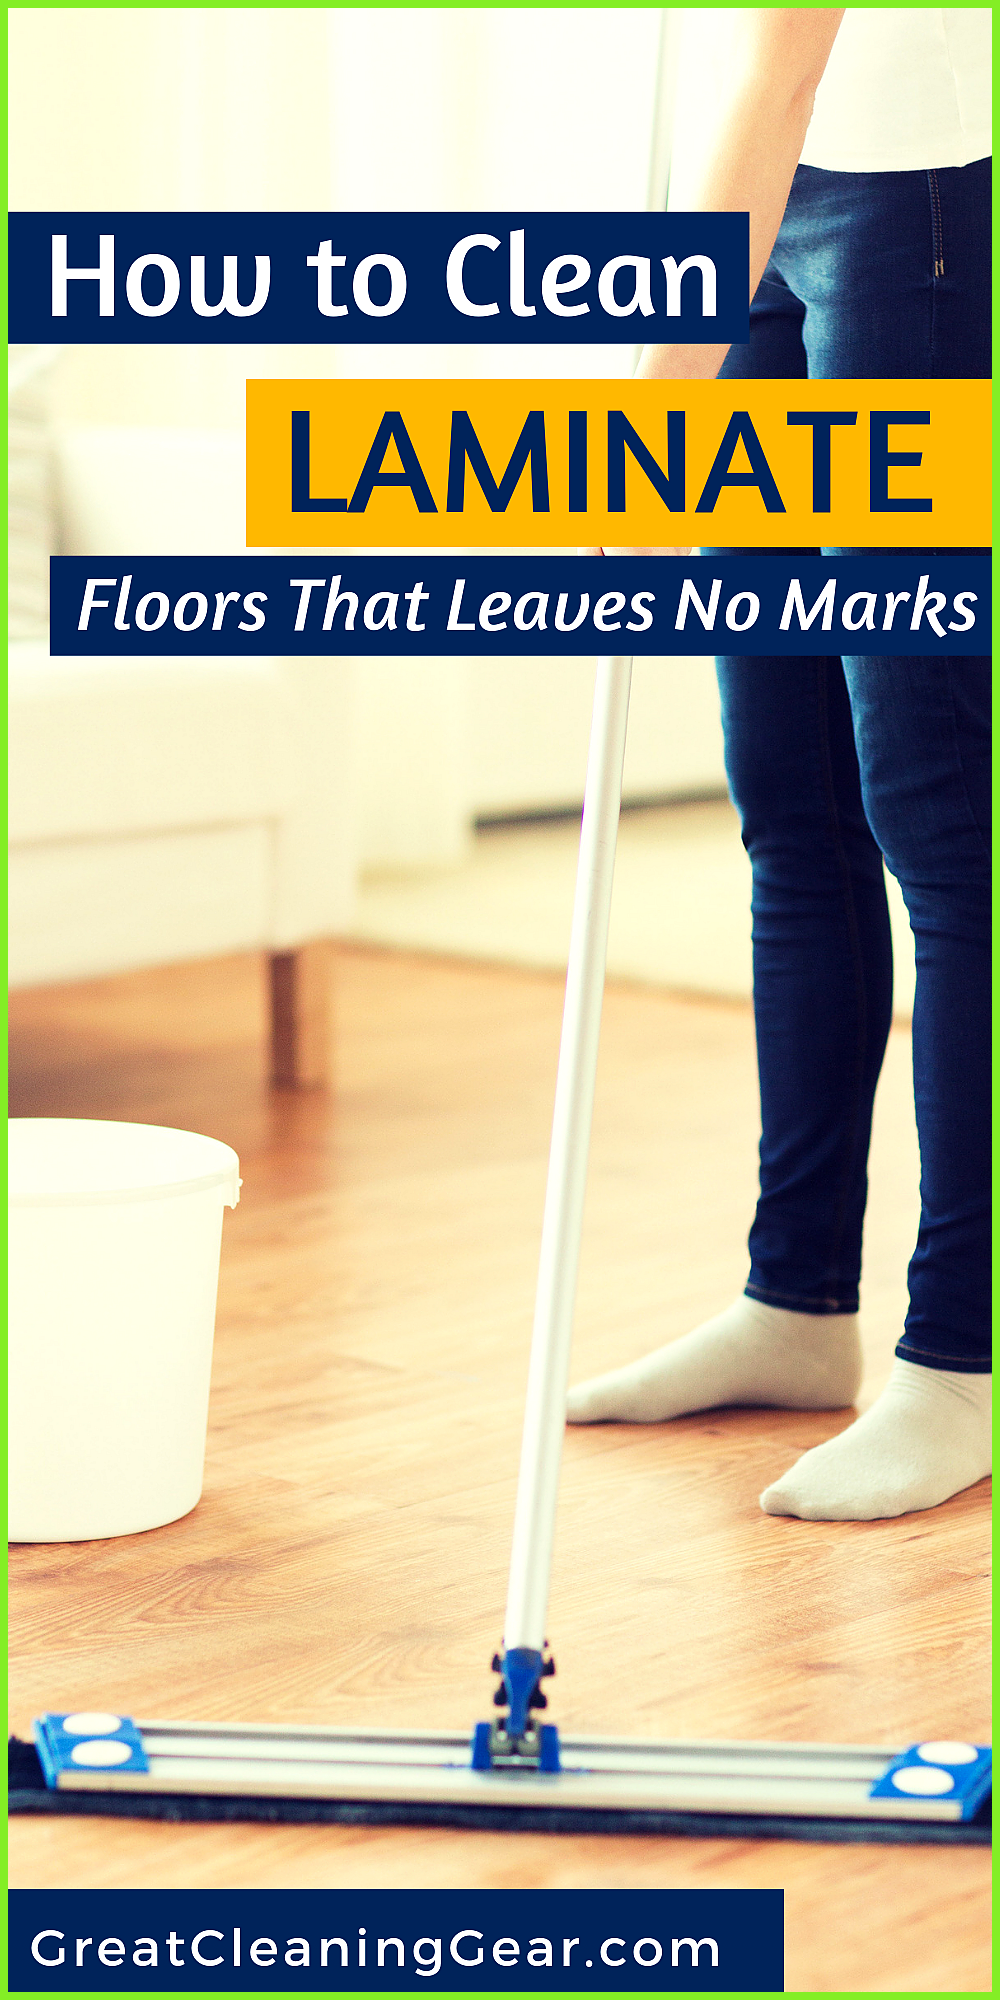 Pedal Bin Treteimerikarus De In 2020 Clean Laminate How To Clean Laminate Flooring Mopping Laminate Floors